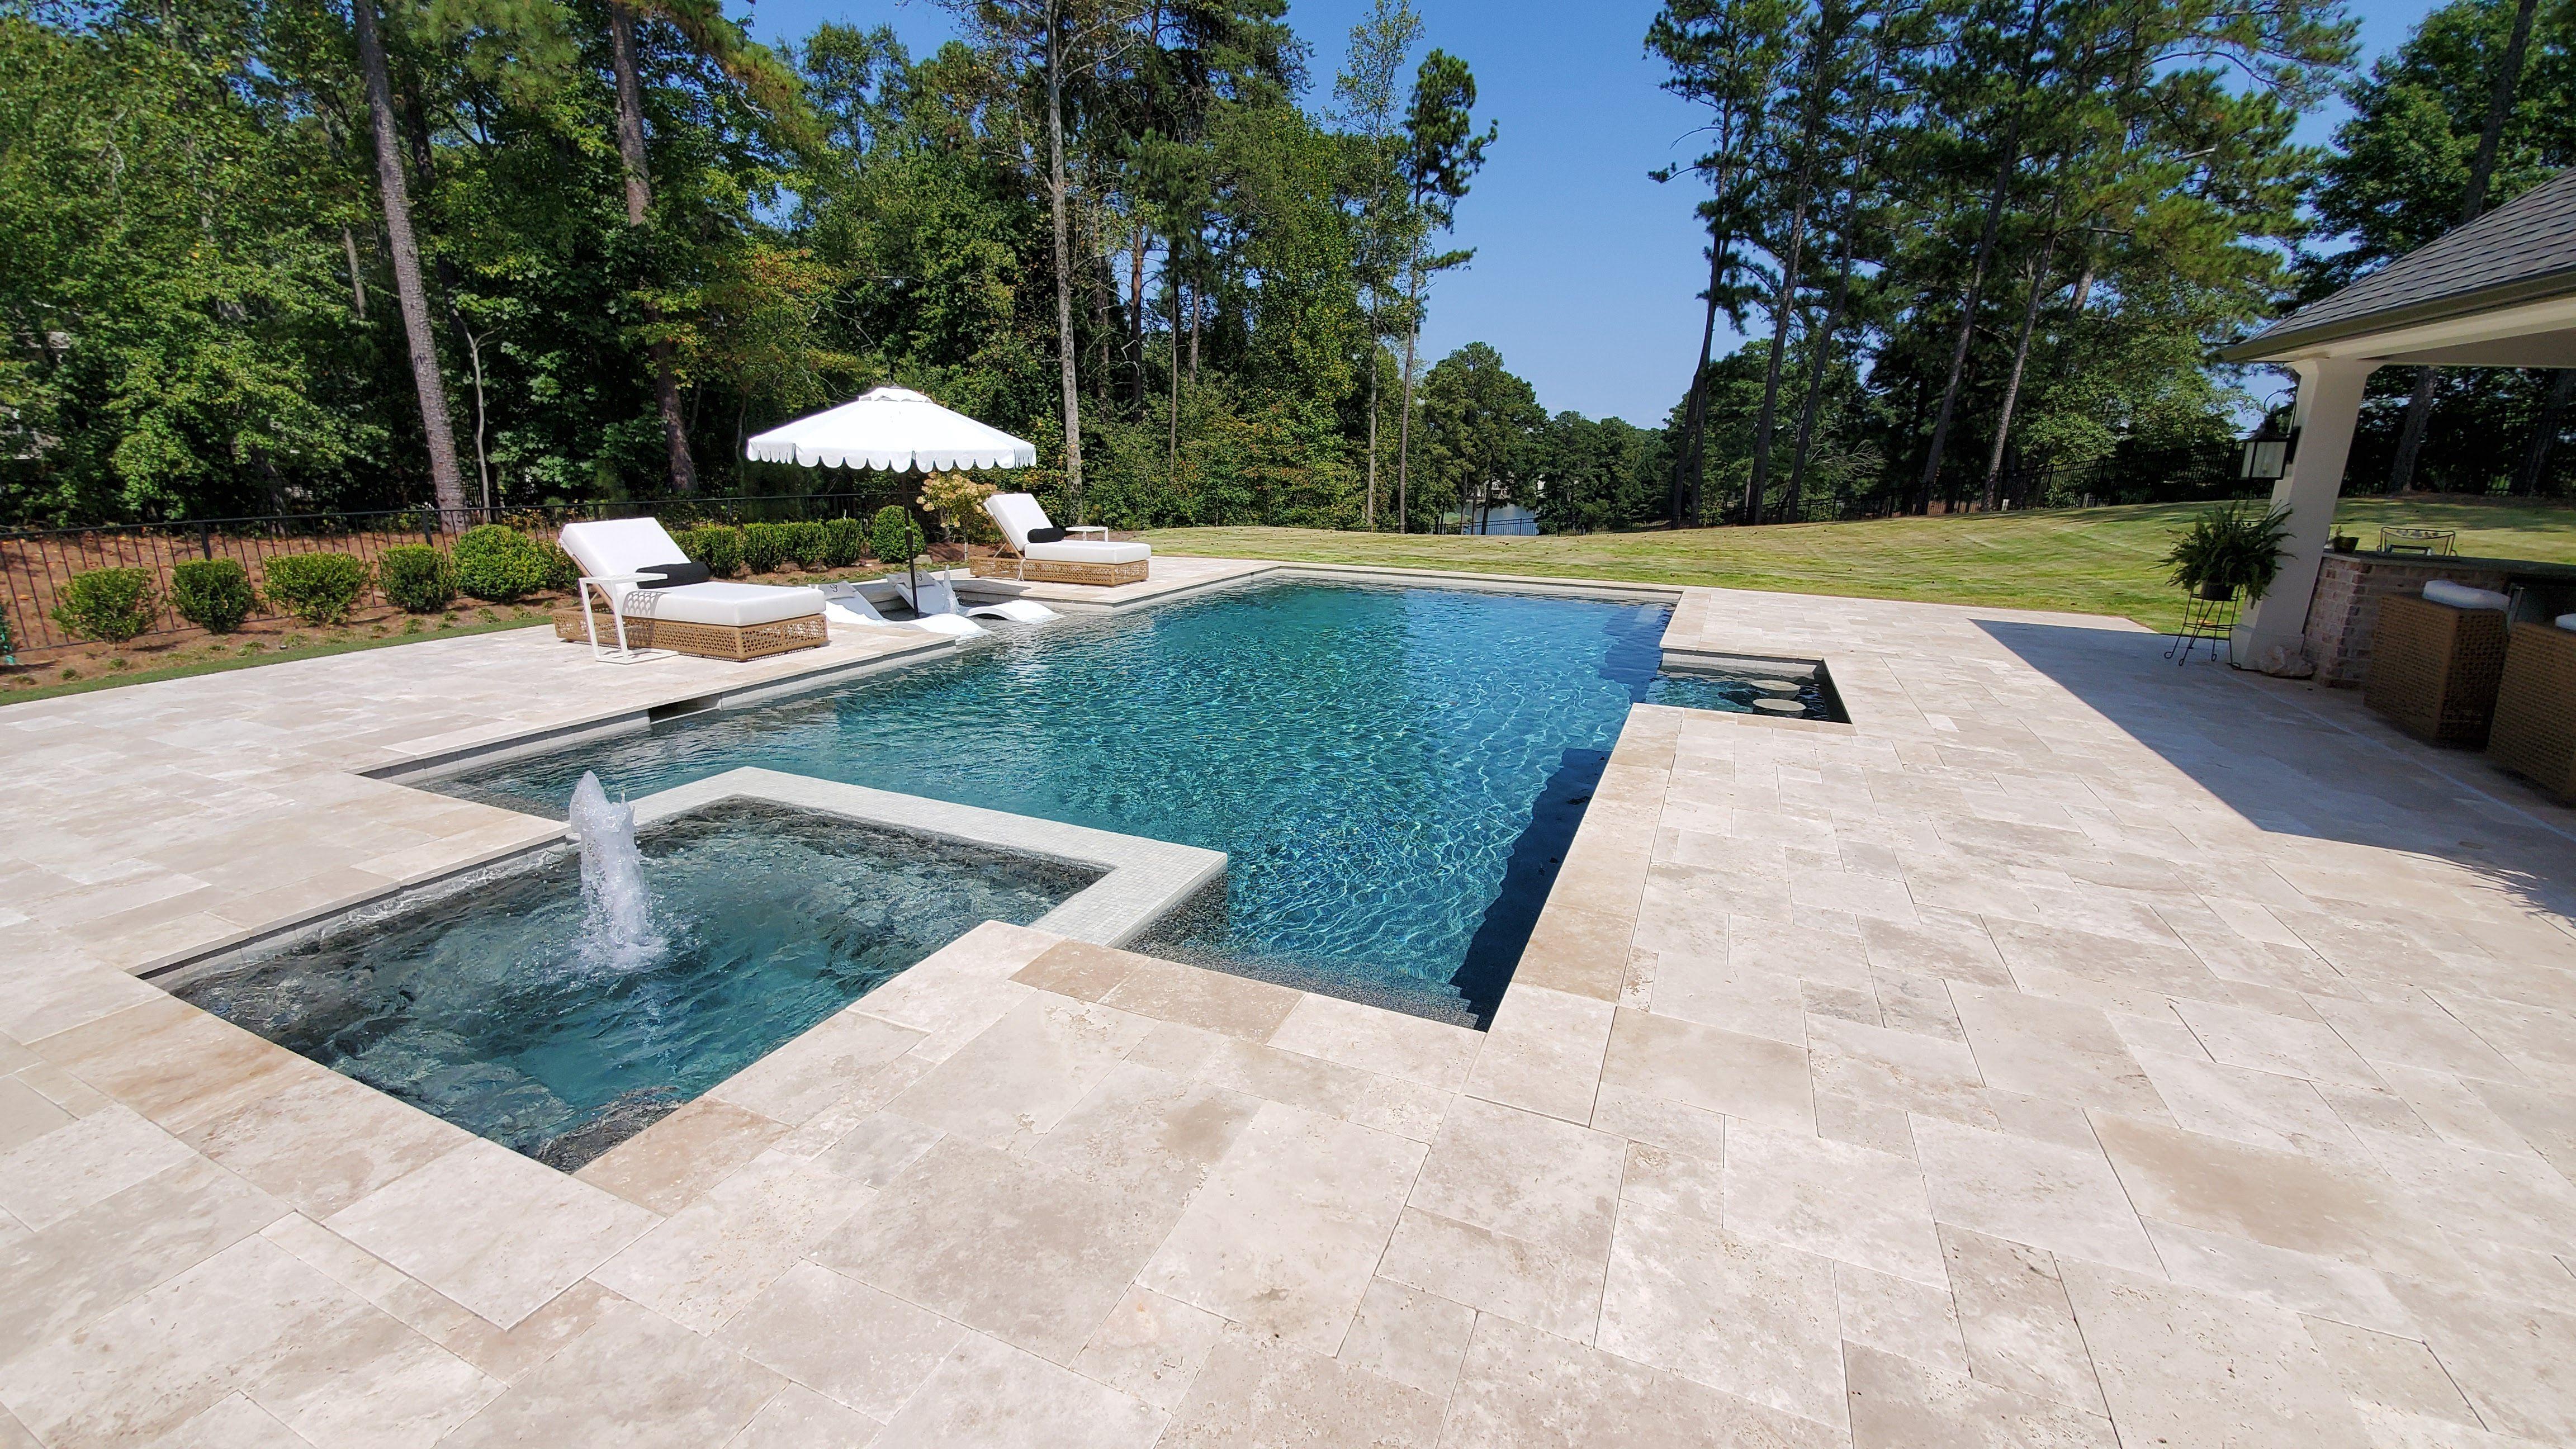 Inground Swimming Pool With Flush Spa Ivory Travertine Deck And Coping Swimming Pools Inground Swimming Pools Luxury Swimming Pools